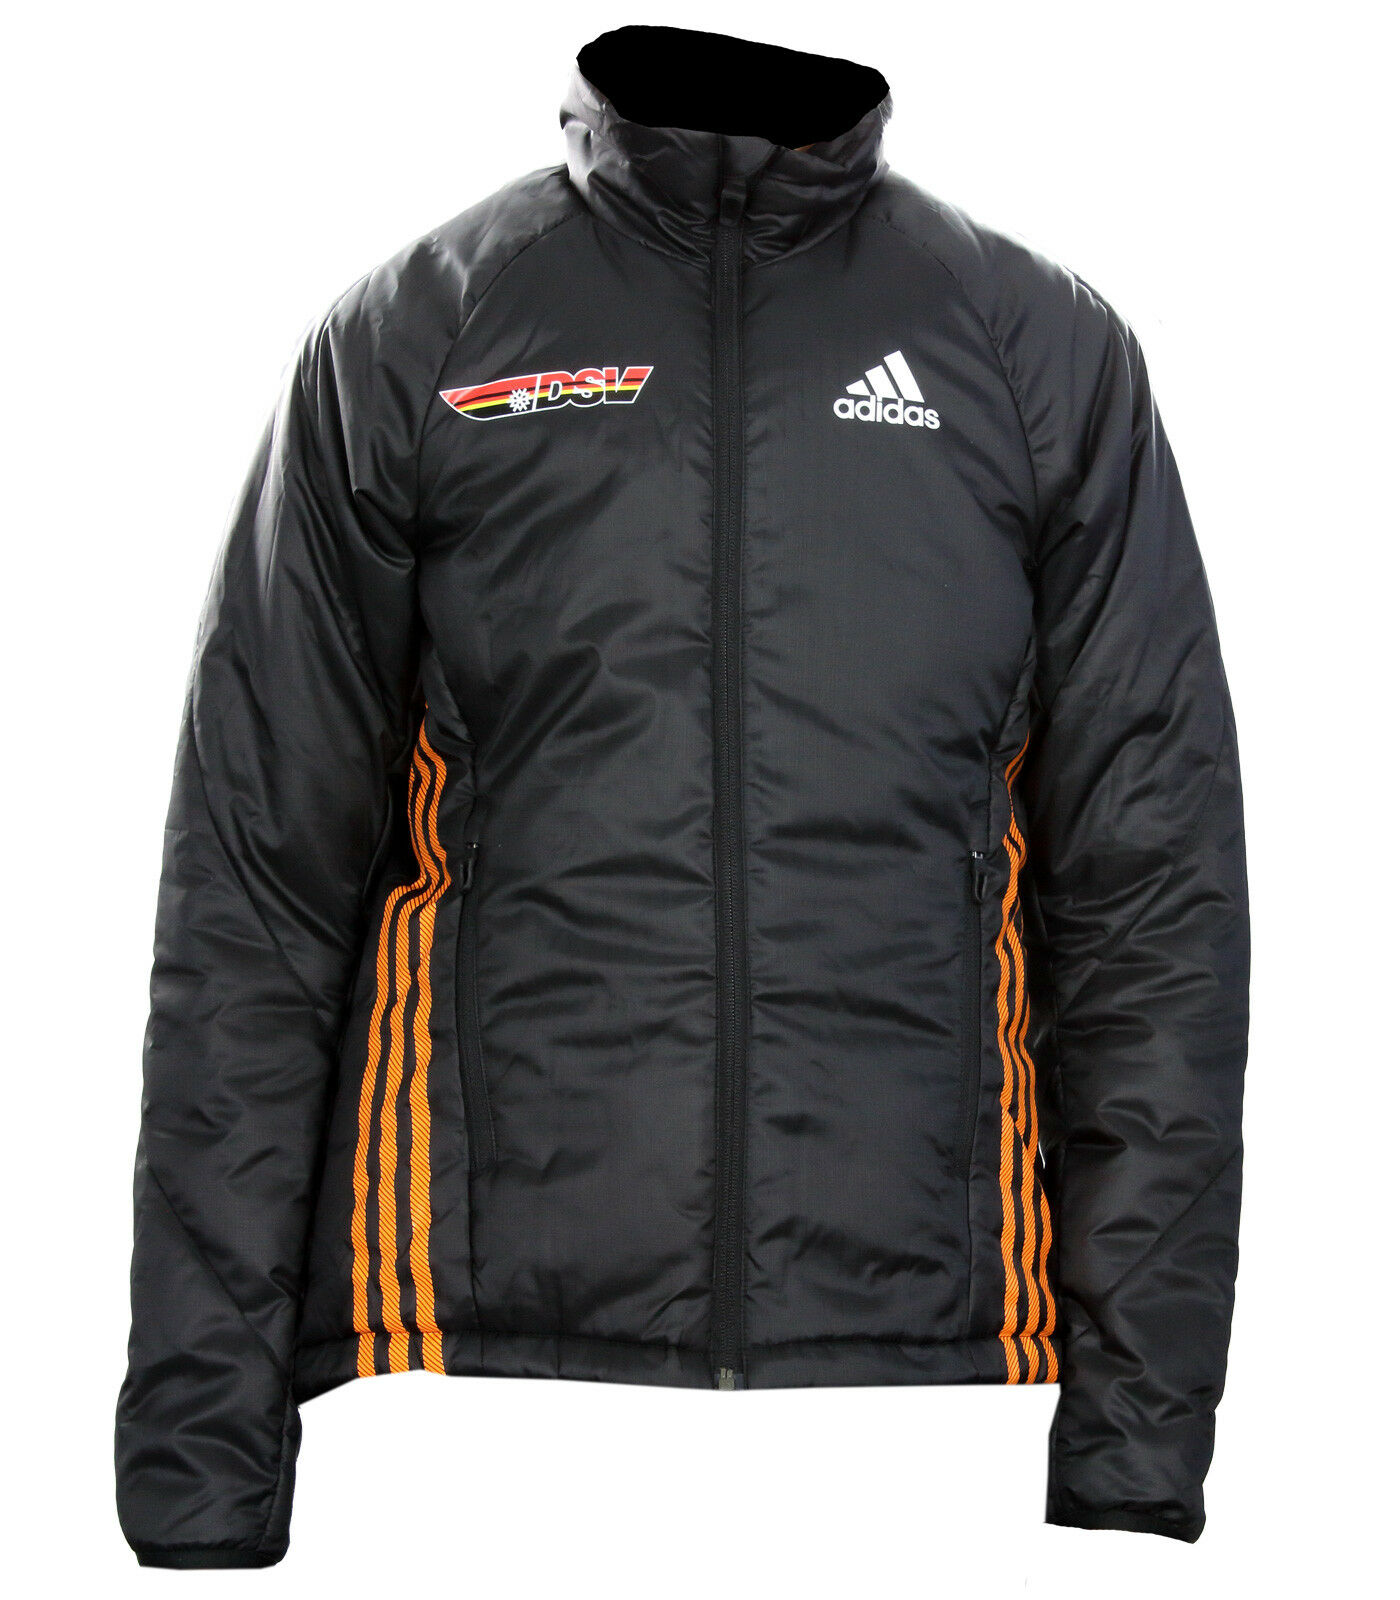 Adidas Damen DSV Athleten Primaloft Jacke Biathlon Langlauf Olympia Olympia Olympia Gr. XS-S f78458